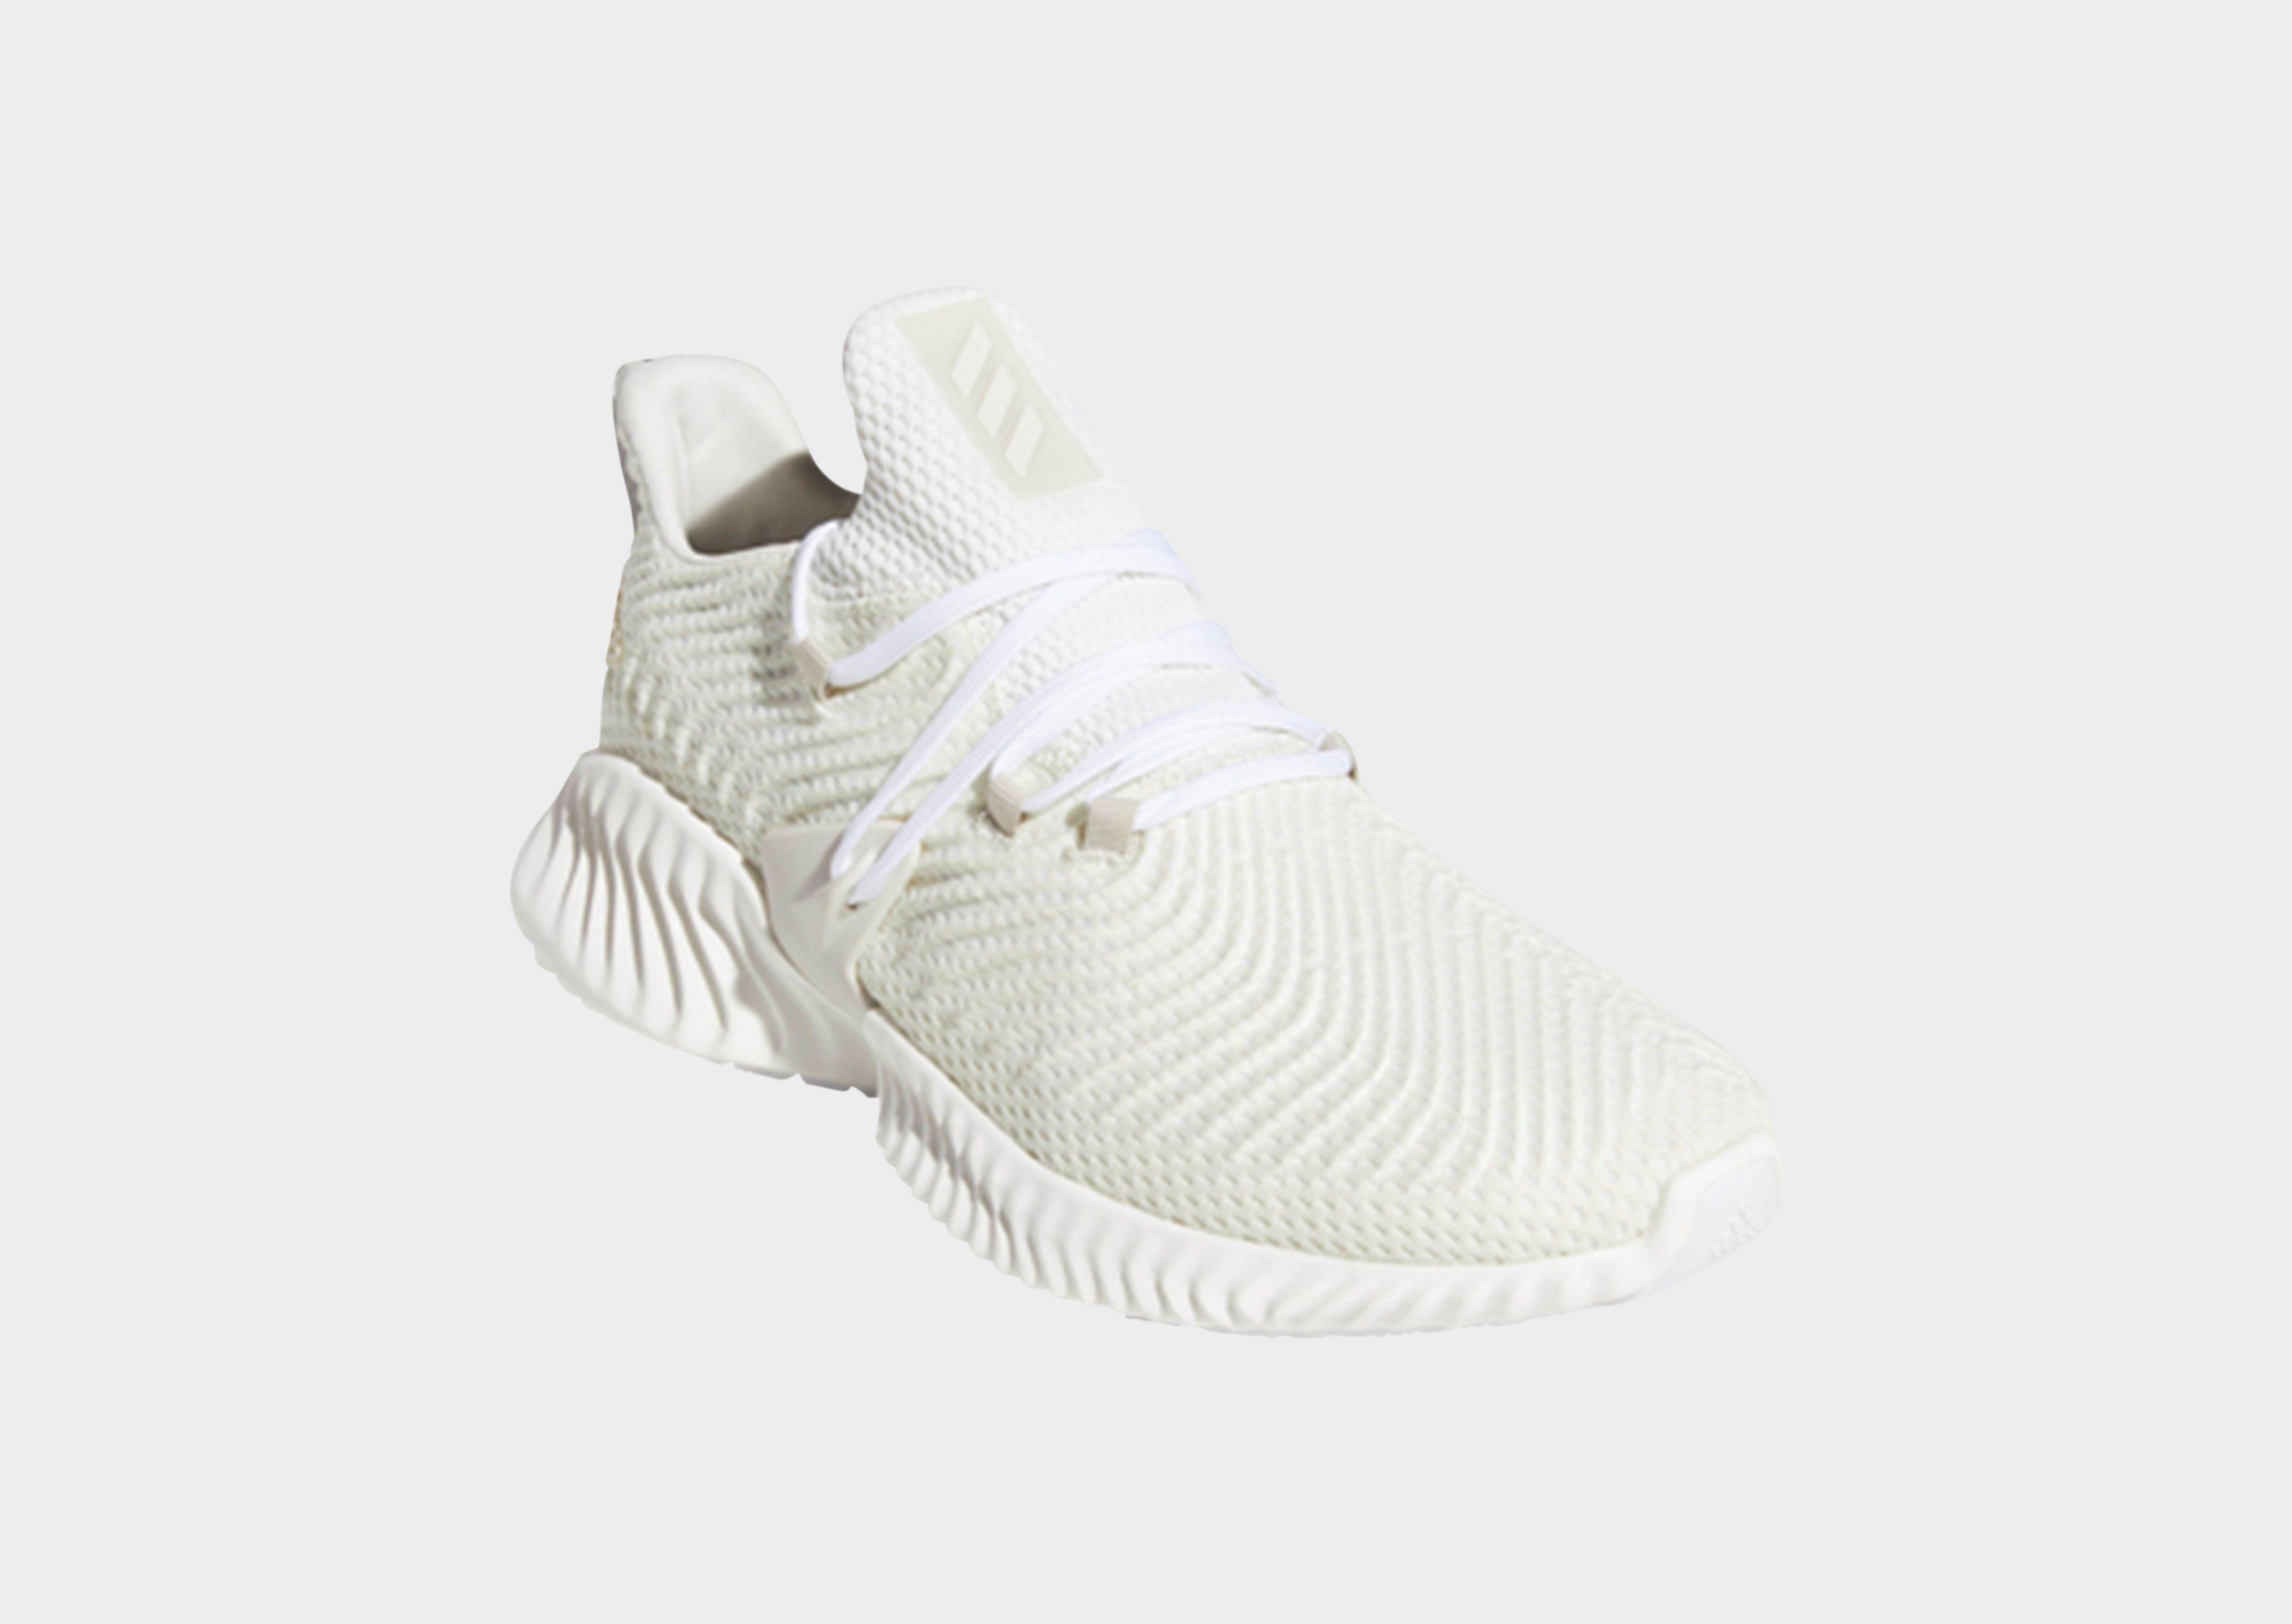 ADIDAS Alphabounce Instinct Shoes